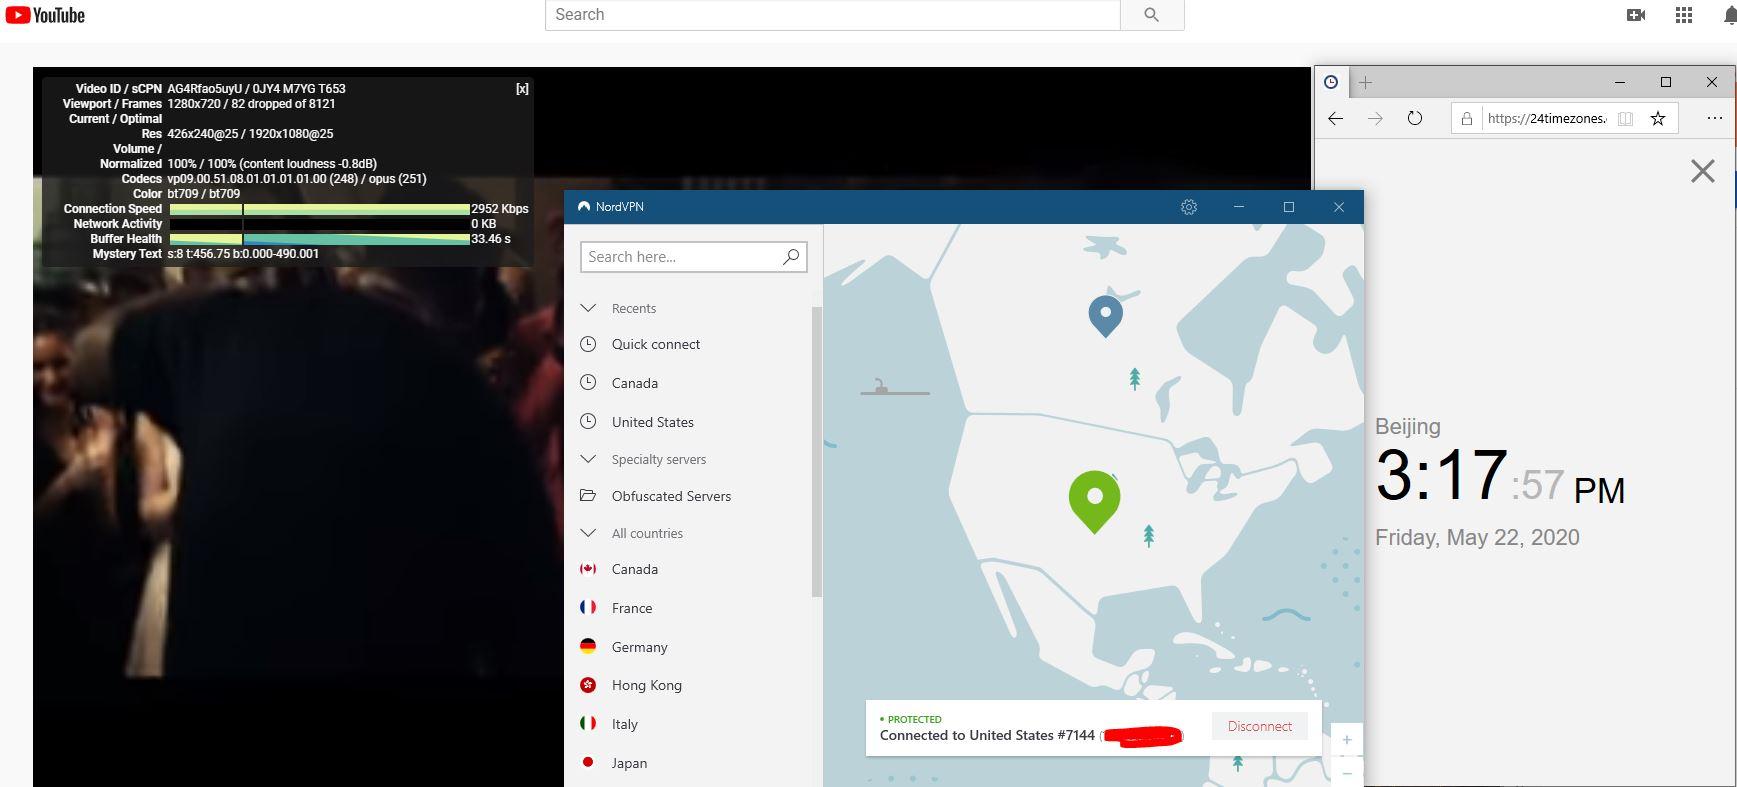 Windows10 NordVPN 混淆开启 USA #7144 中国VPN 翻墙 科学上网 youtube测速-20200522